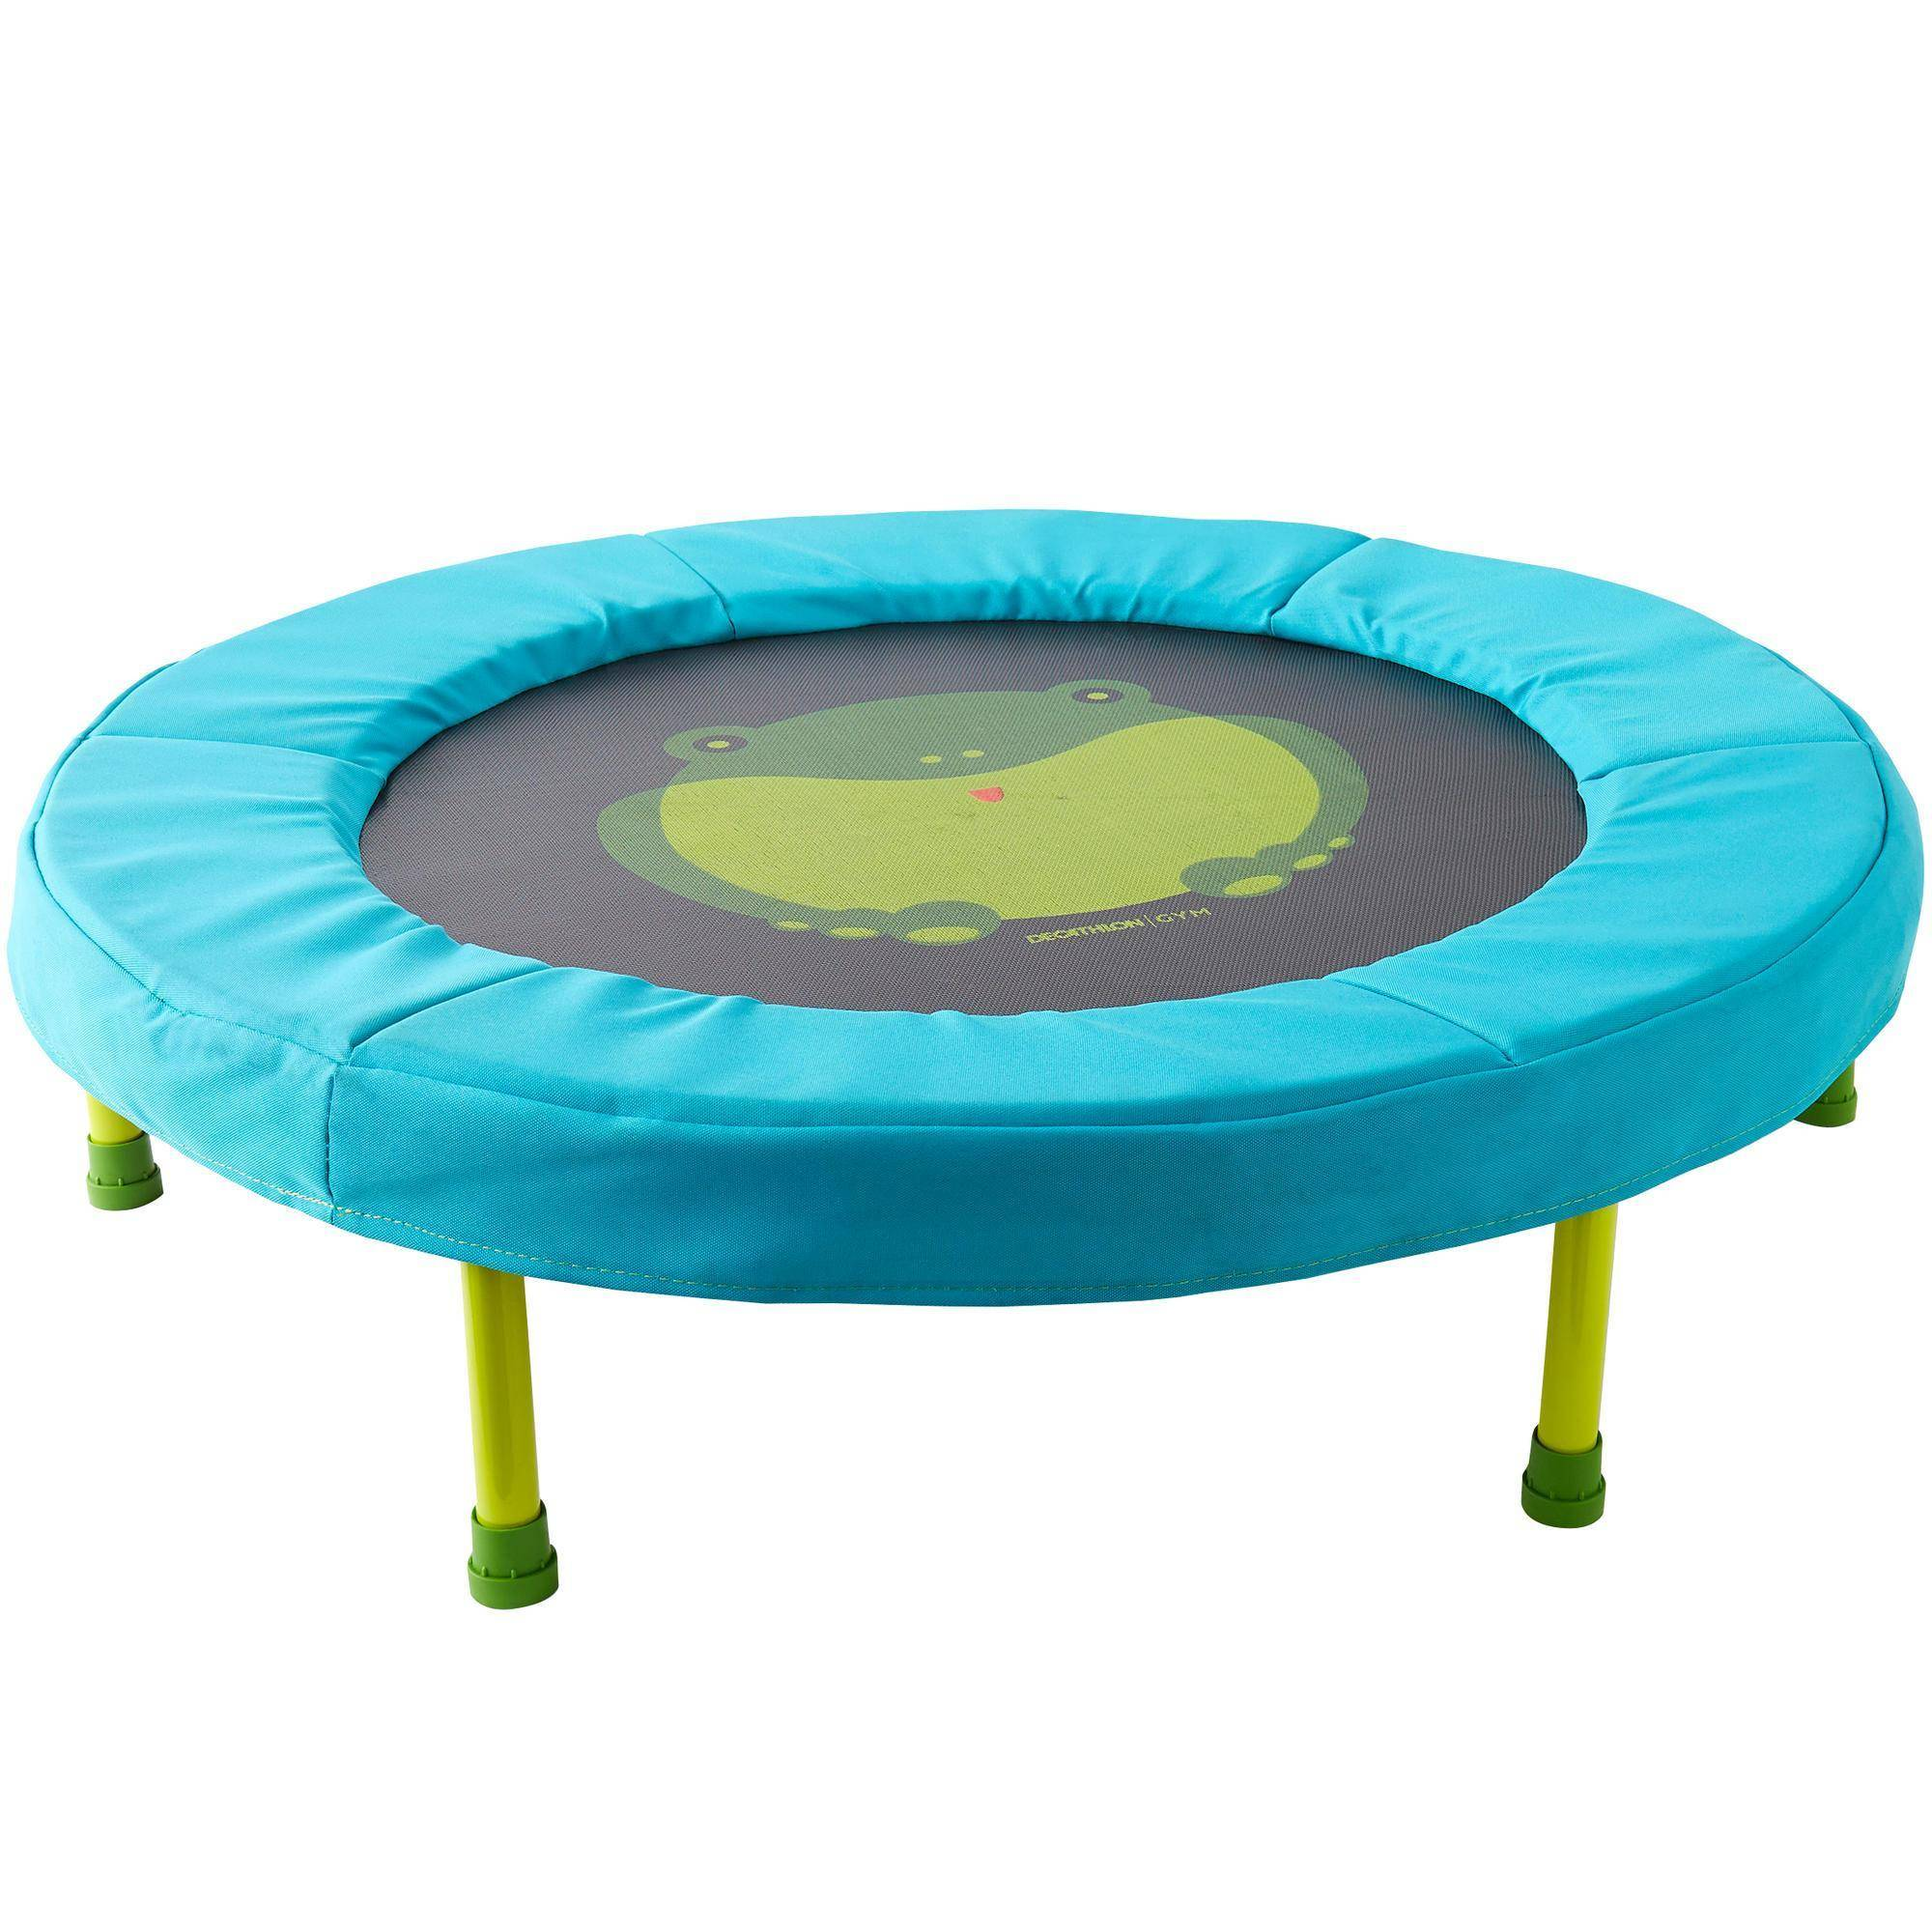 DOMYOS Mini trampoline baby gym - DOMYOS - SANS TAILLE